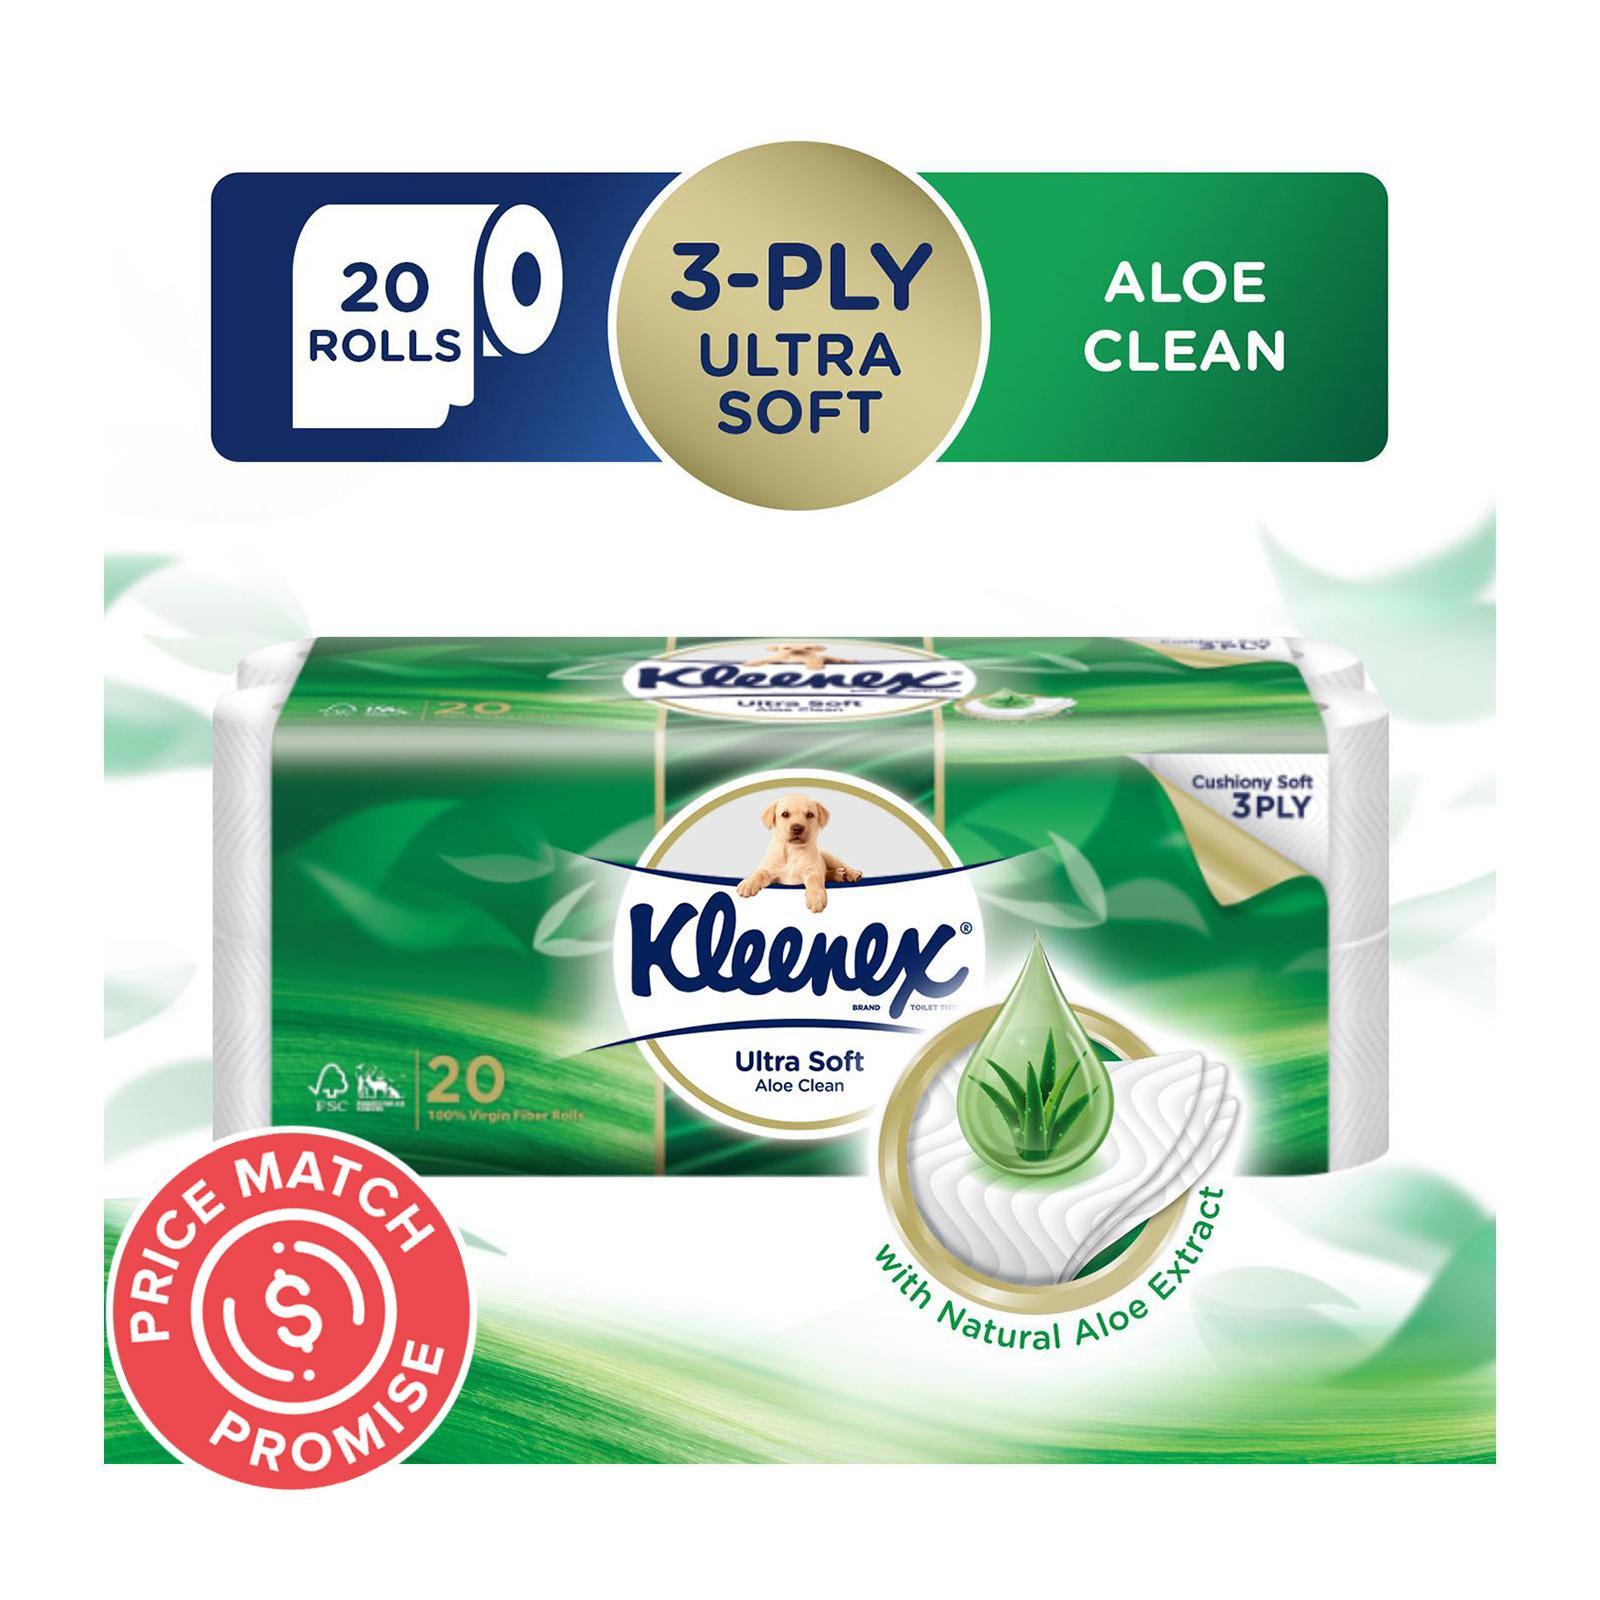 Kleenex Ultra Soft Aloe Clean 3-Ply Toilet Tissue - 20 Rolls